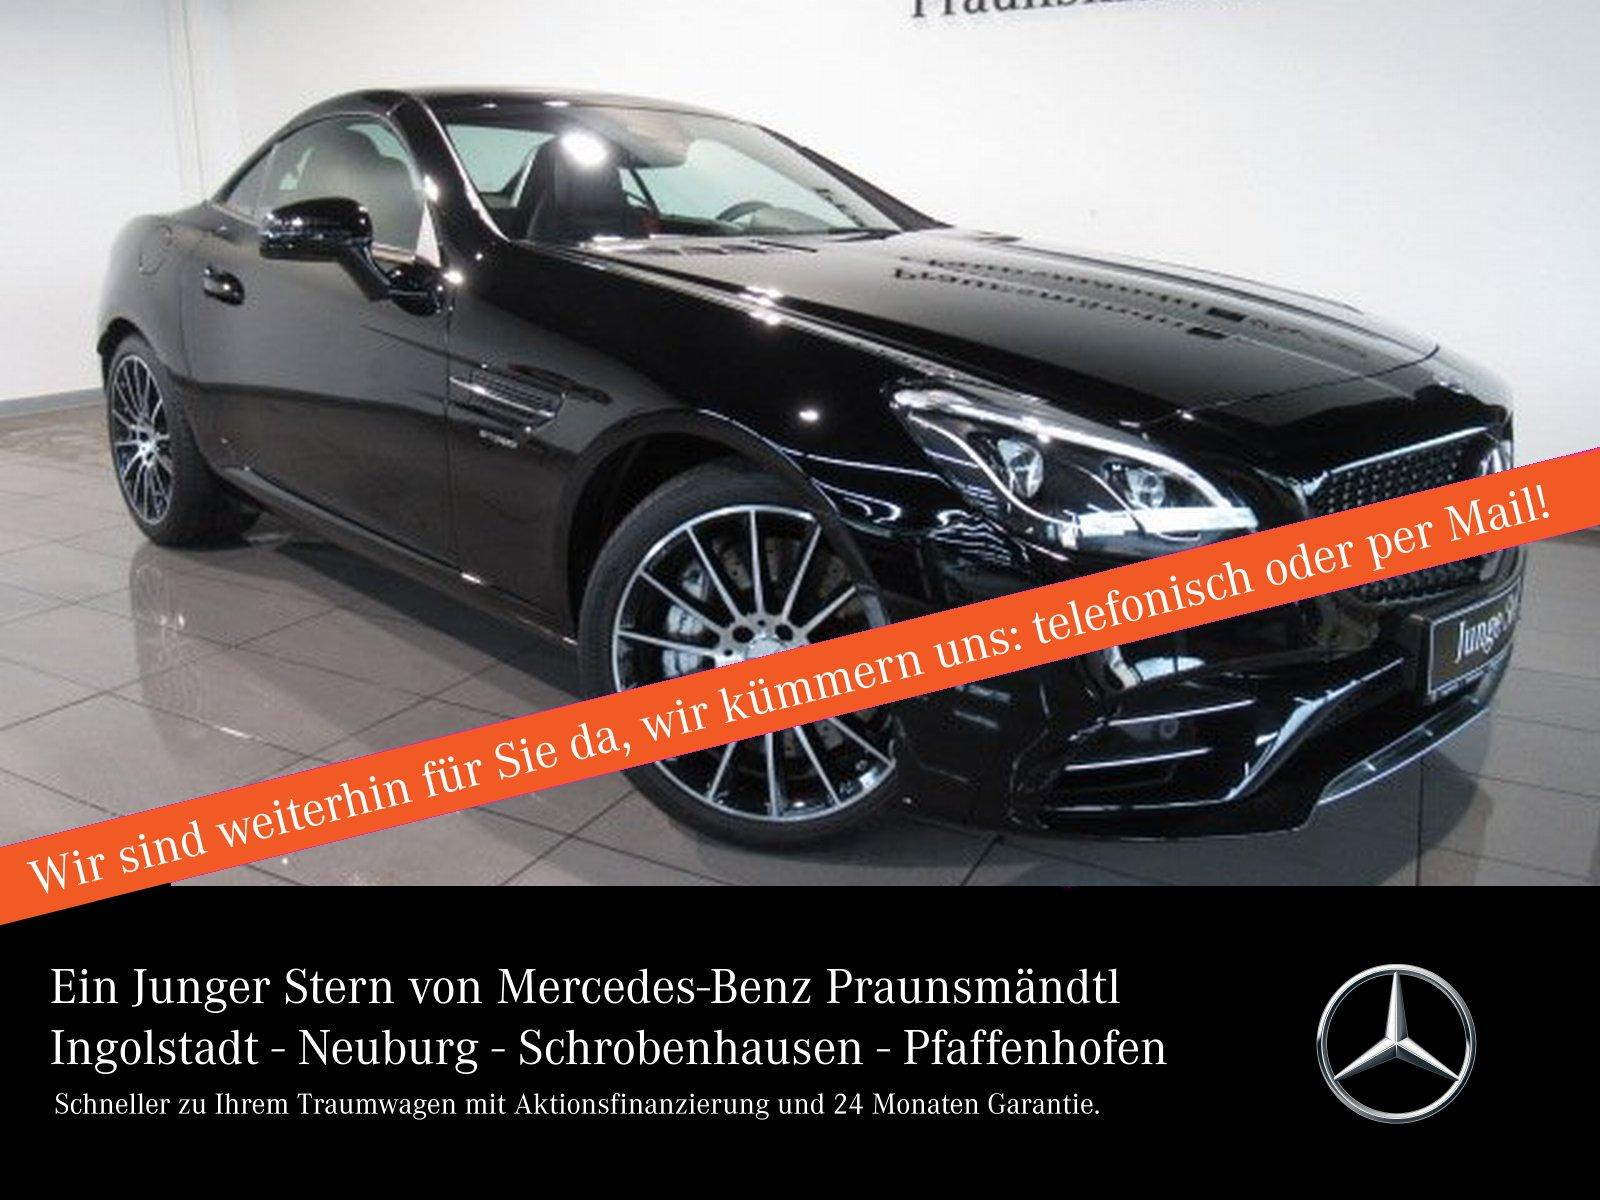 Mercedes-Benz SLC 43 AMG MEMORY/AIRSCARF/Sound/PANORAMA/Comand, Jahr 2018, Benzin